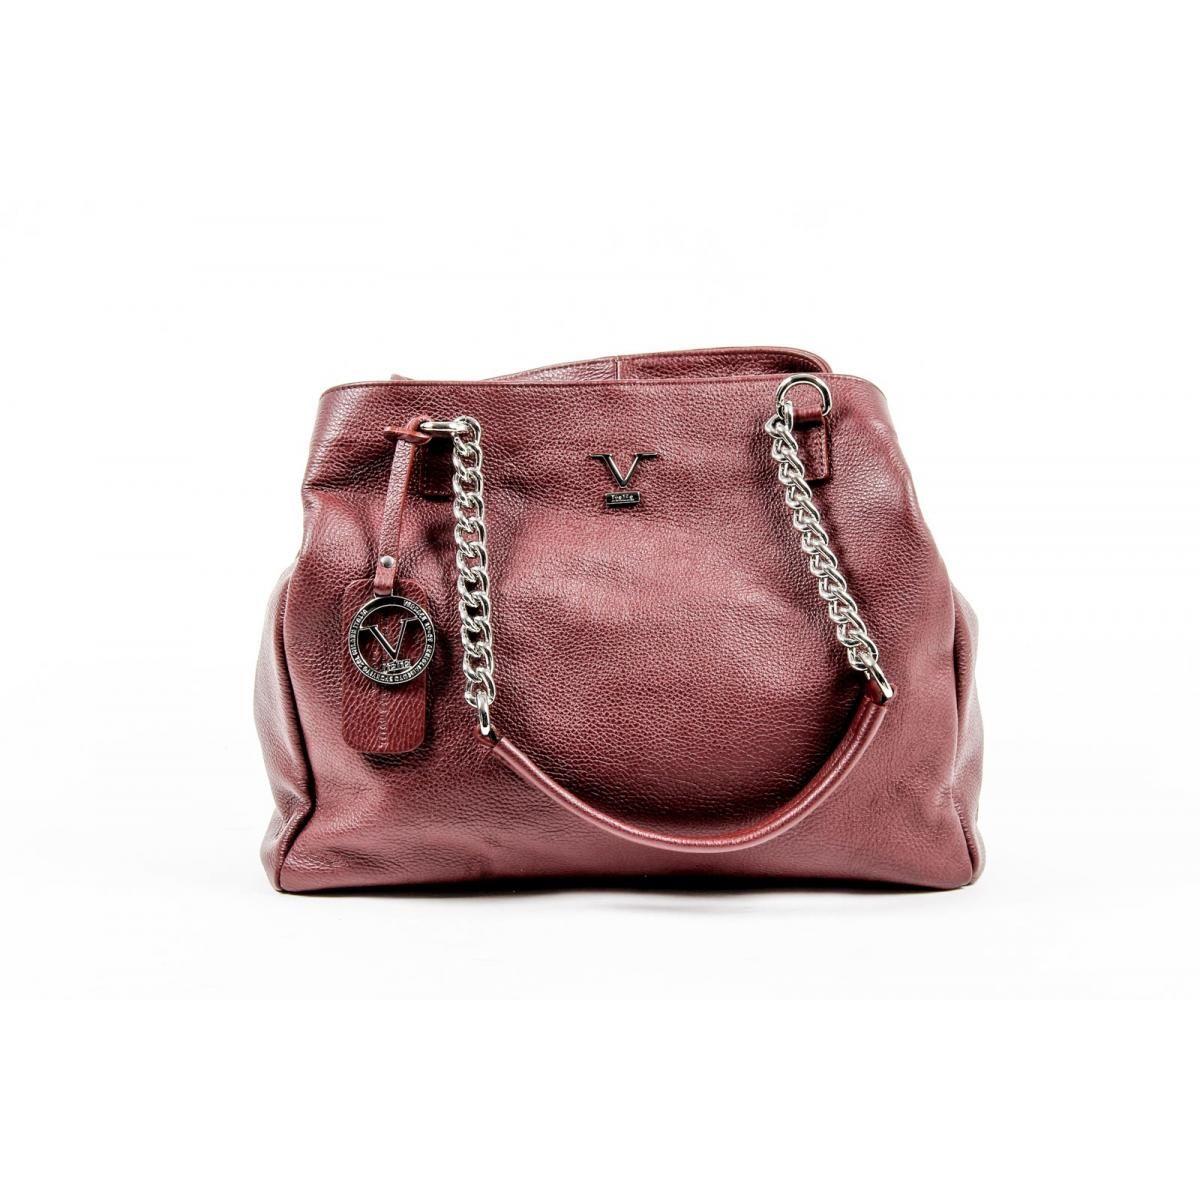 4a8f9dffb9 V 1969 Italia Womens Handbag V012 S BORDEAUX